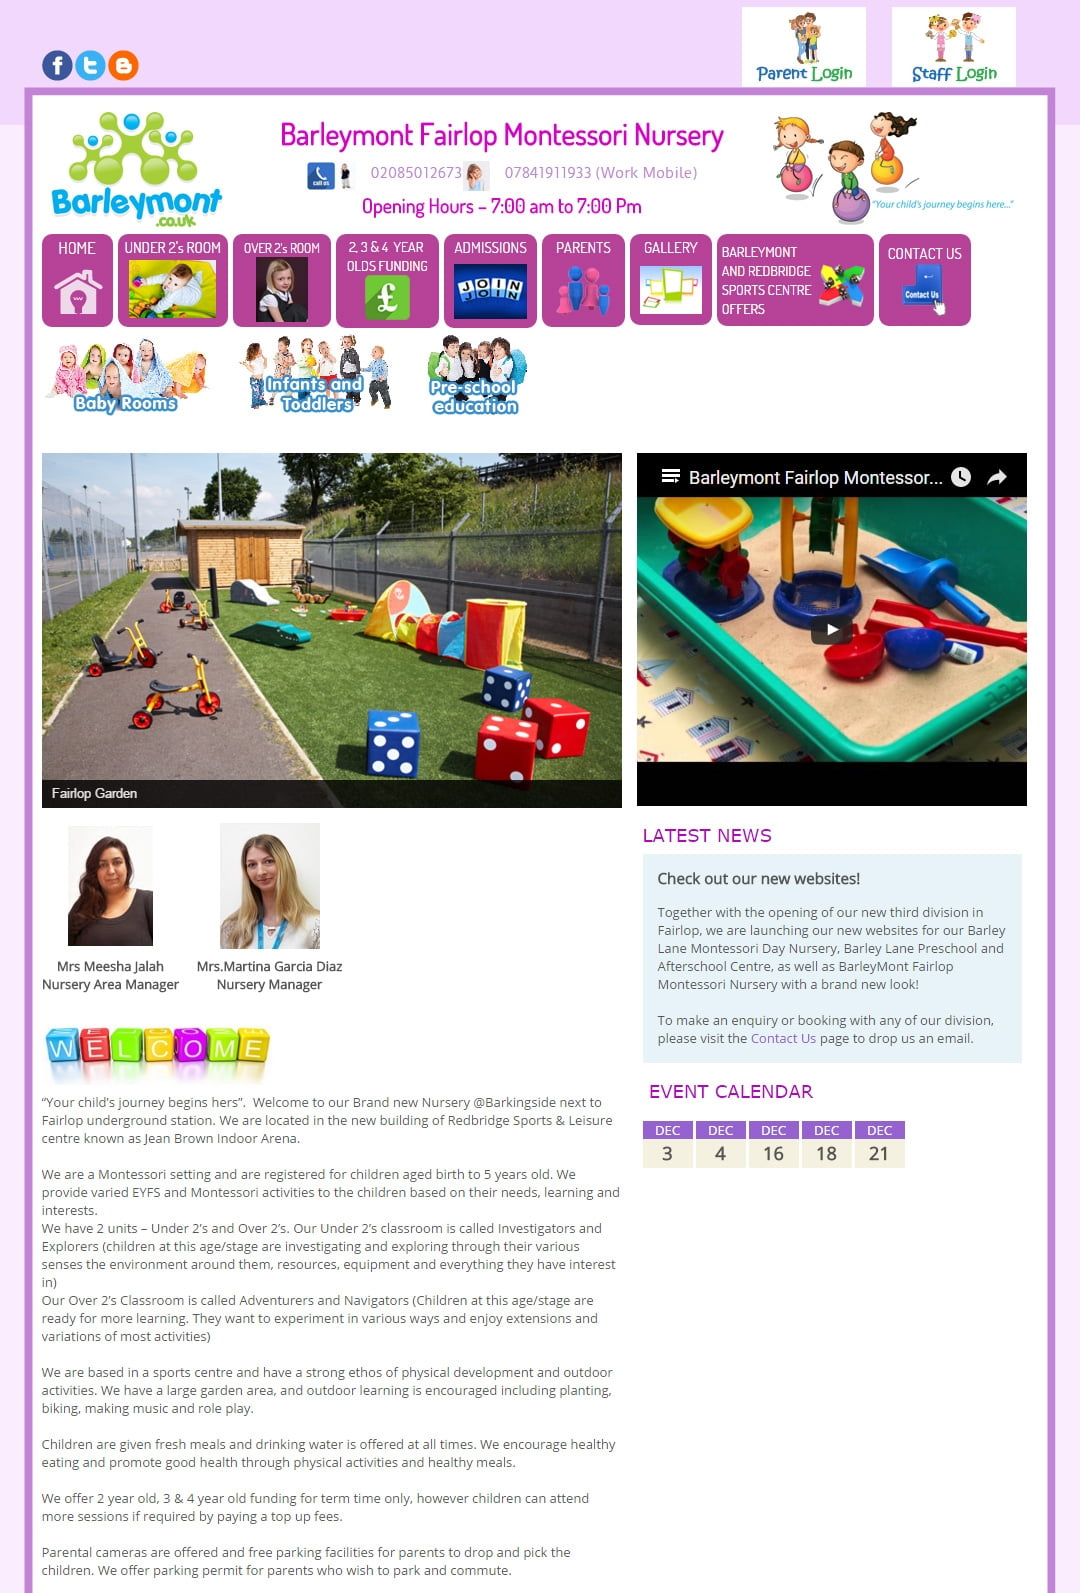 Barleymont Fairlop Montessori Nursery